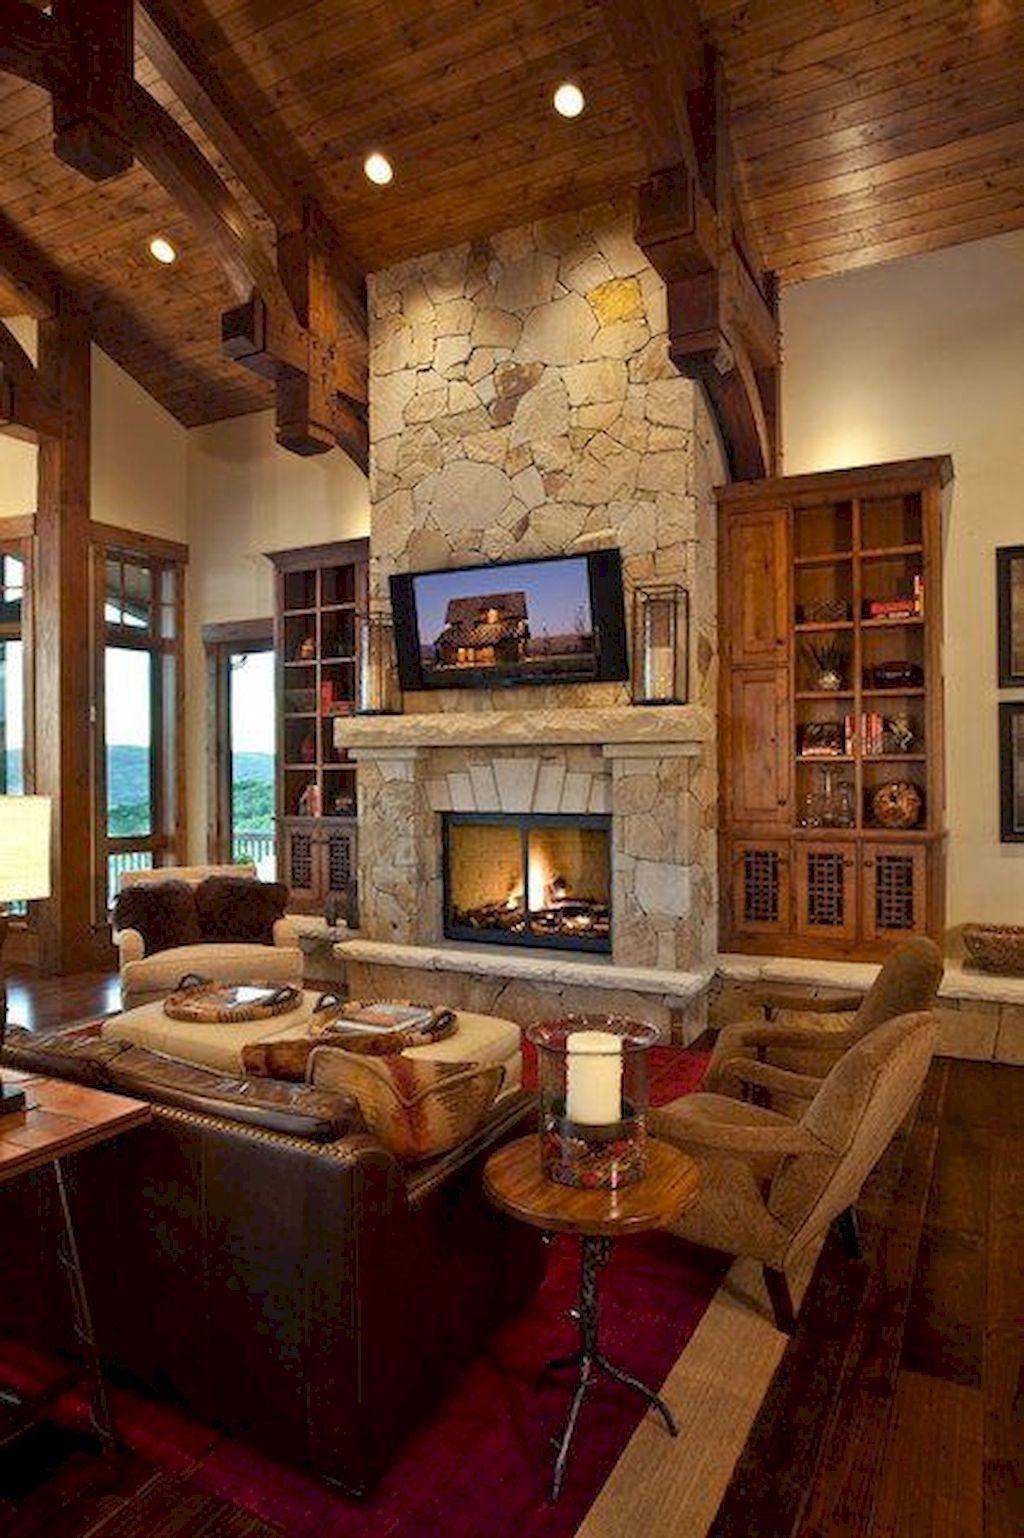 13 cozy farmhouse living room decor ideas | Rustic living ...